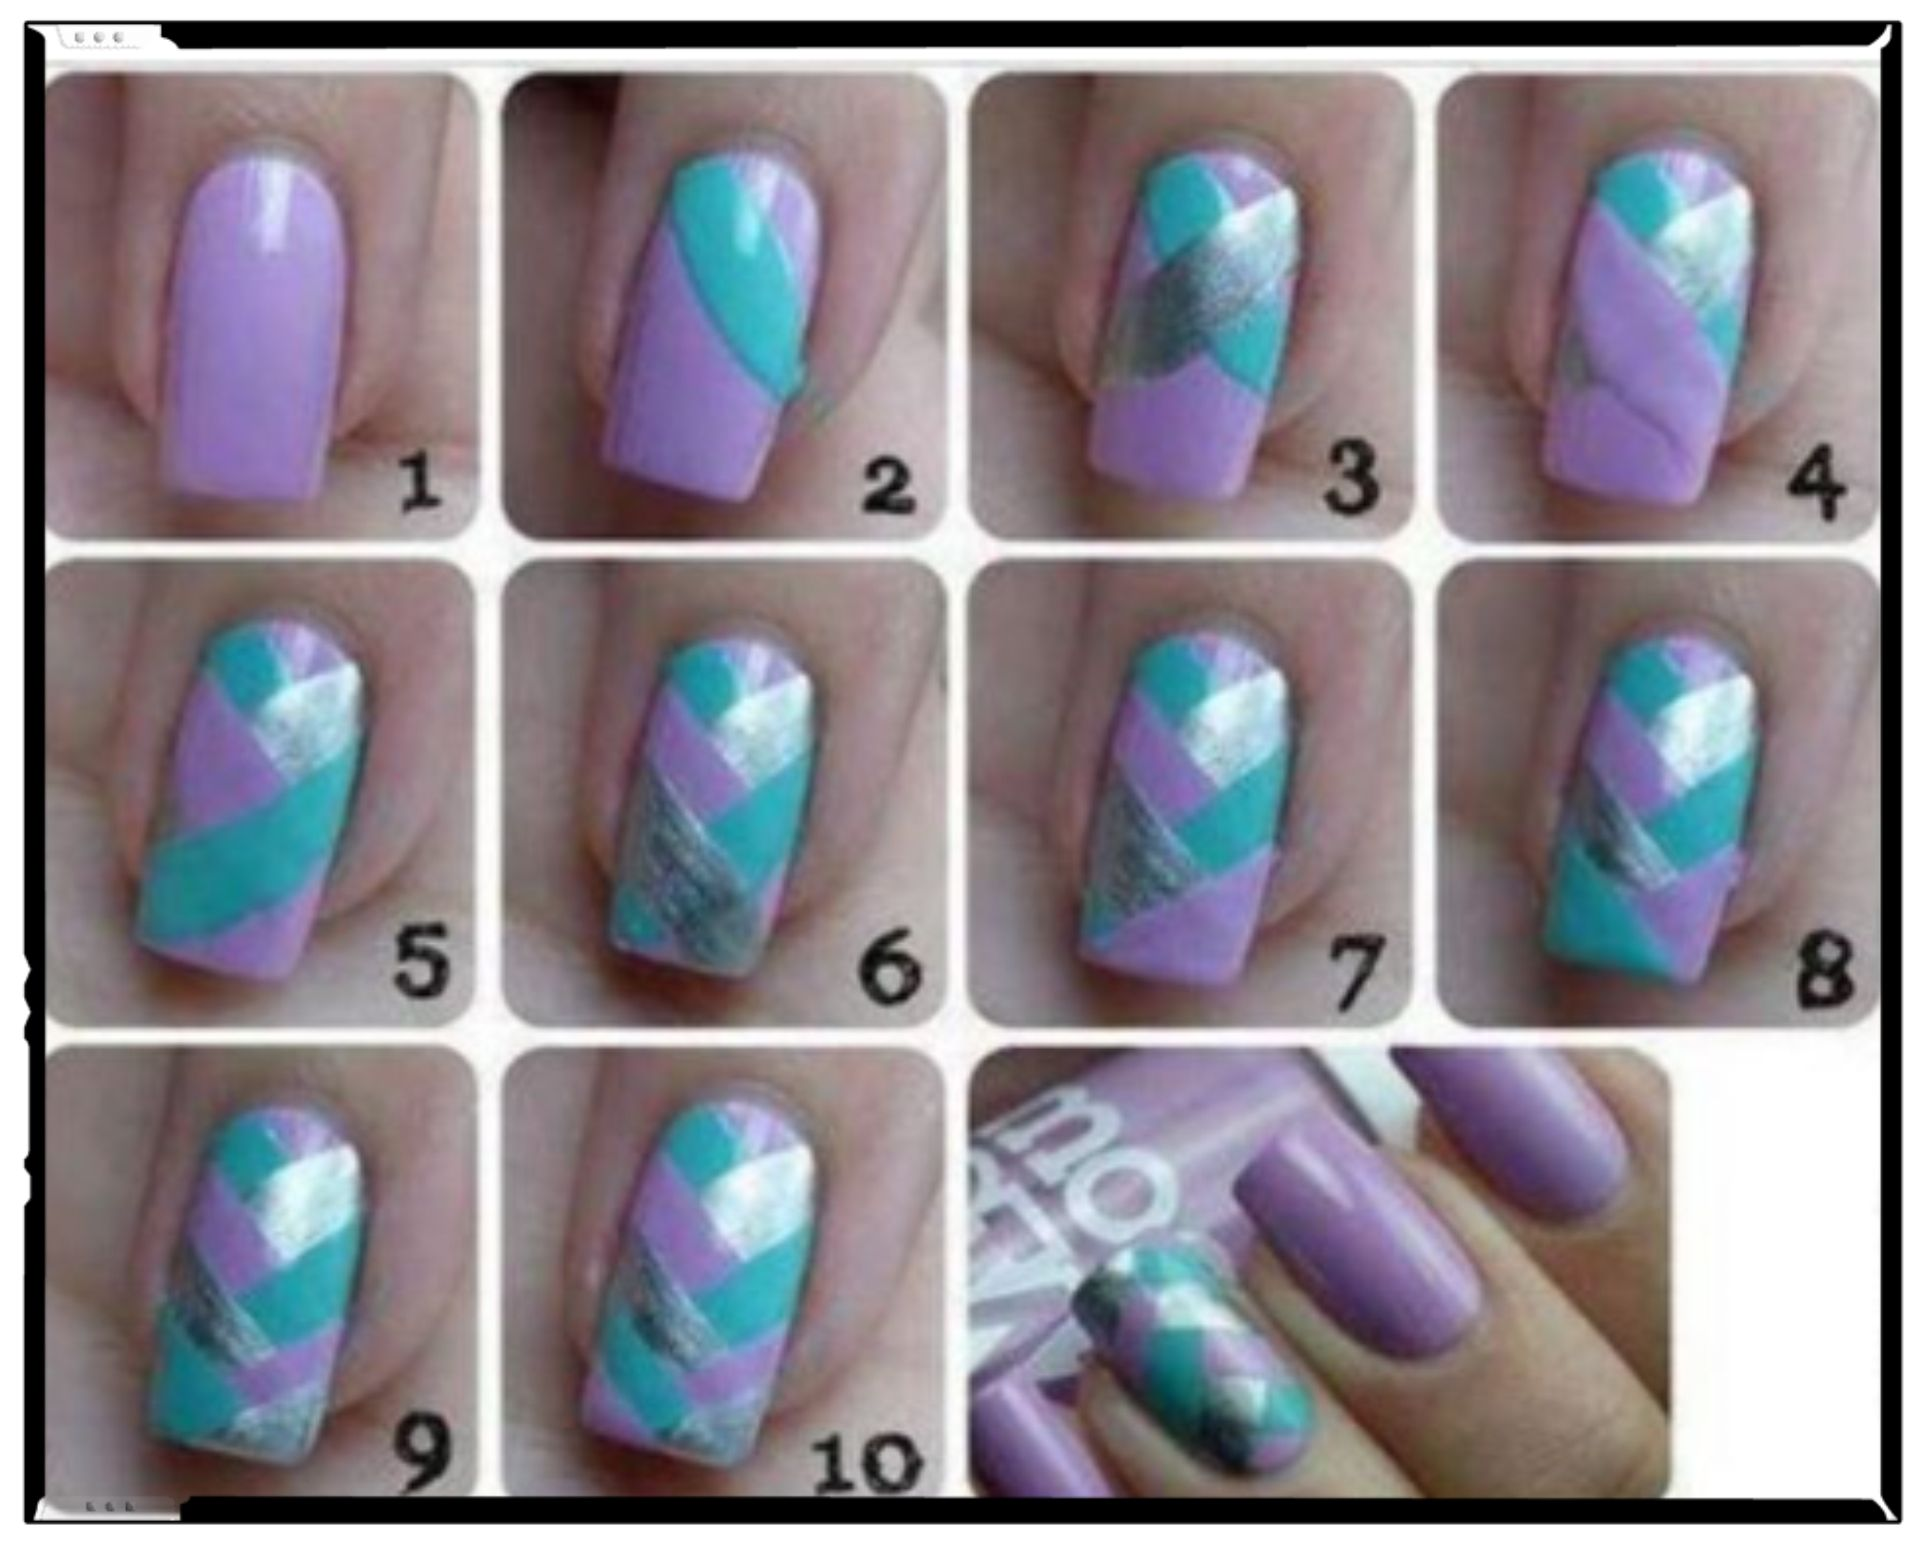 Vernis Simple A Realiser Sans Materiel Mermaid Nail Art Nail Art Manicure Mermaid Nails